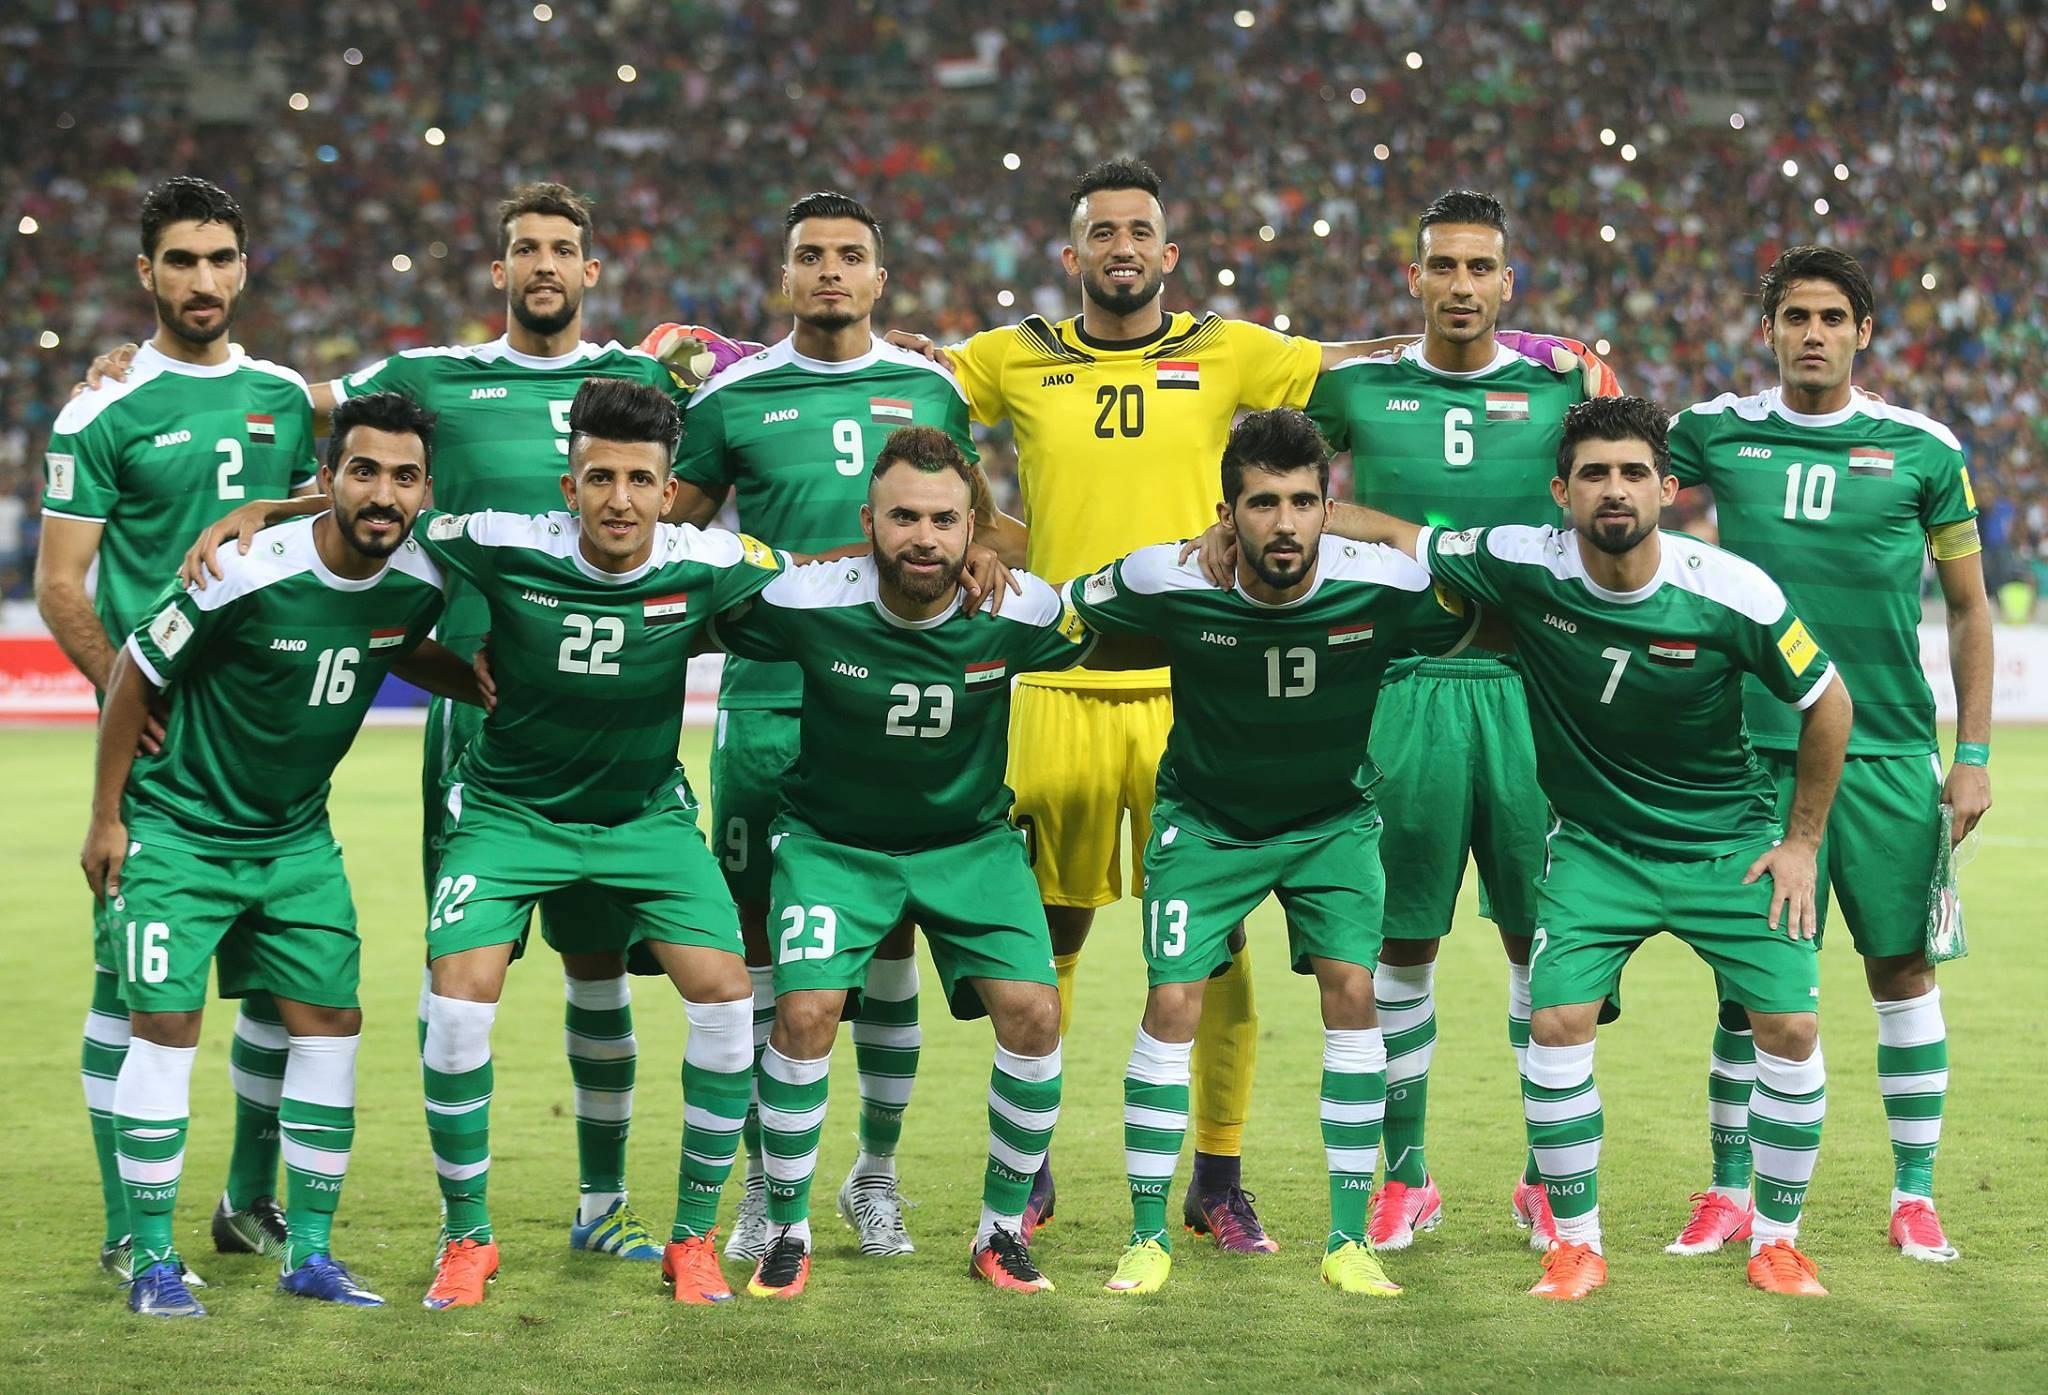 Iraq hosts first international friendly since 2013